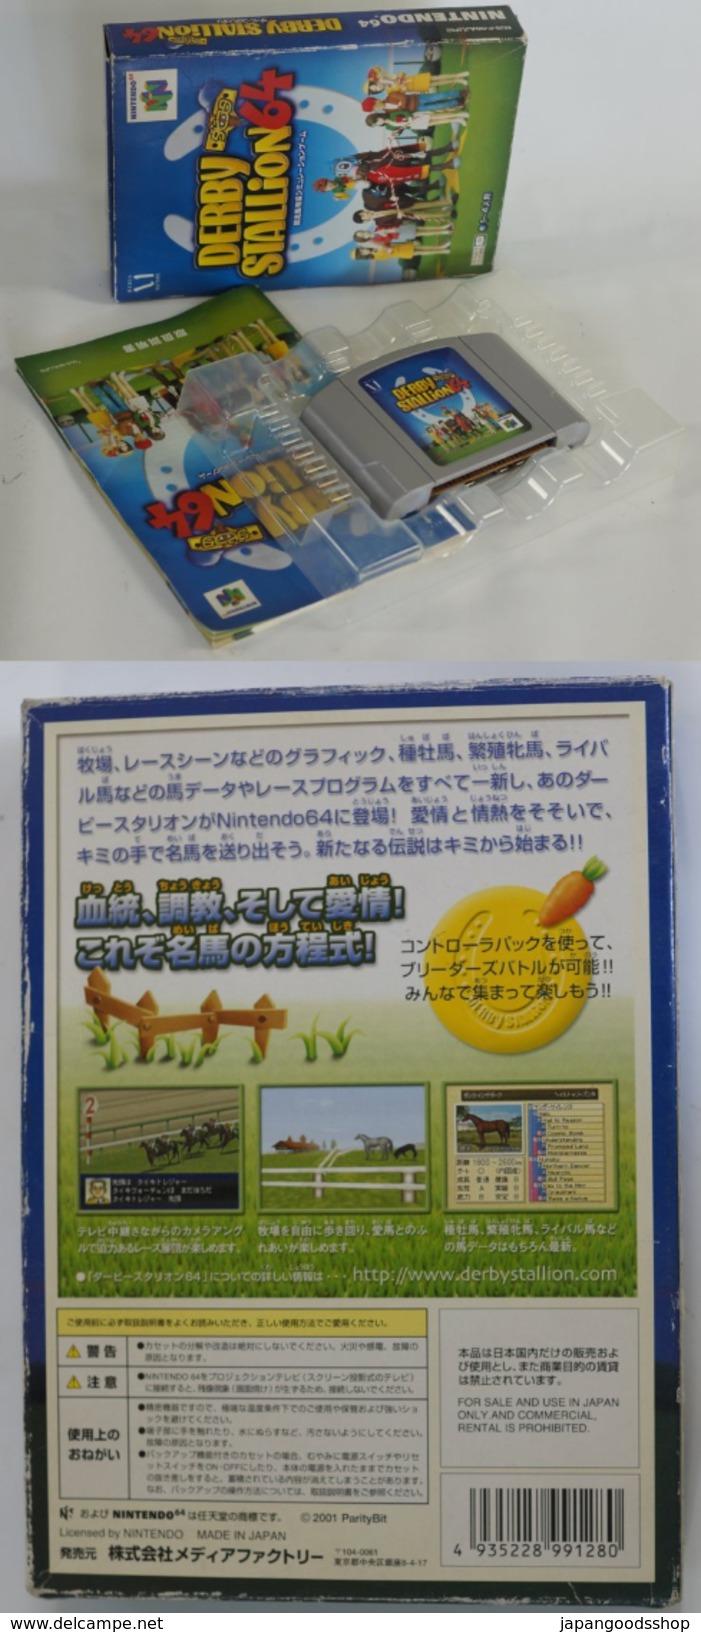 N64 Japanese : Derby Stallion 64 NUS-P-NDAJ(JPN) - Nintendo 64